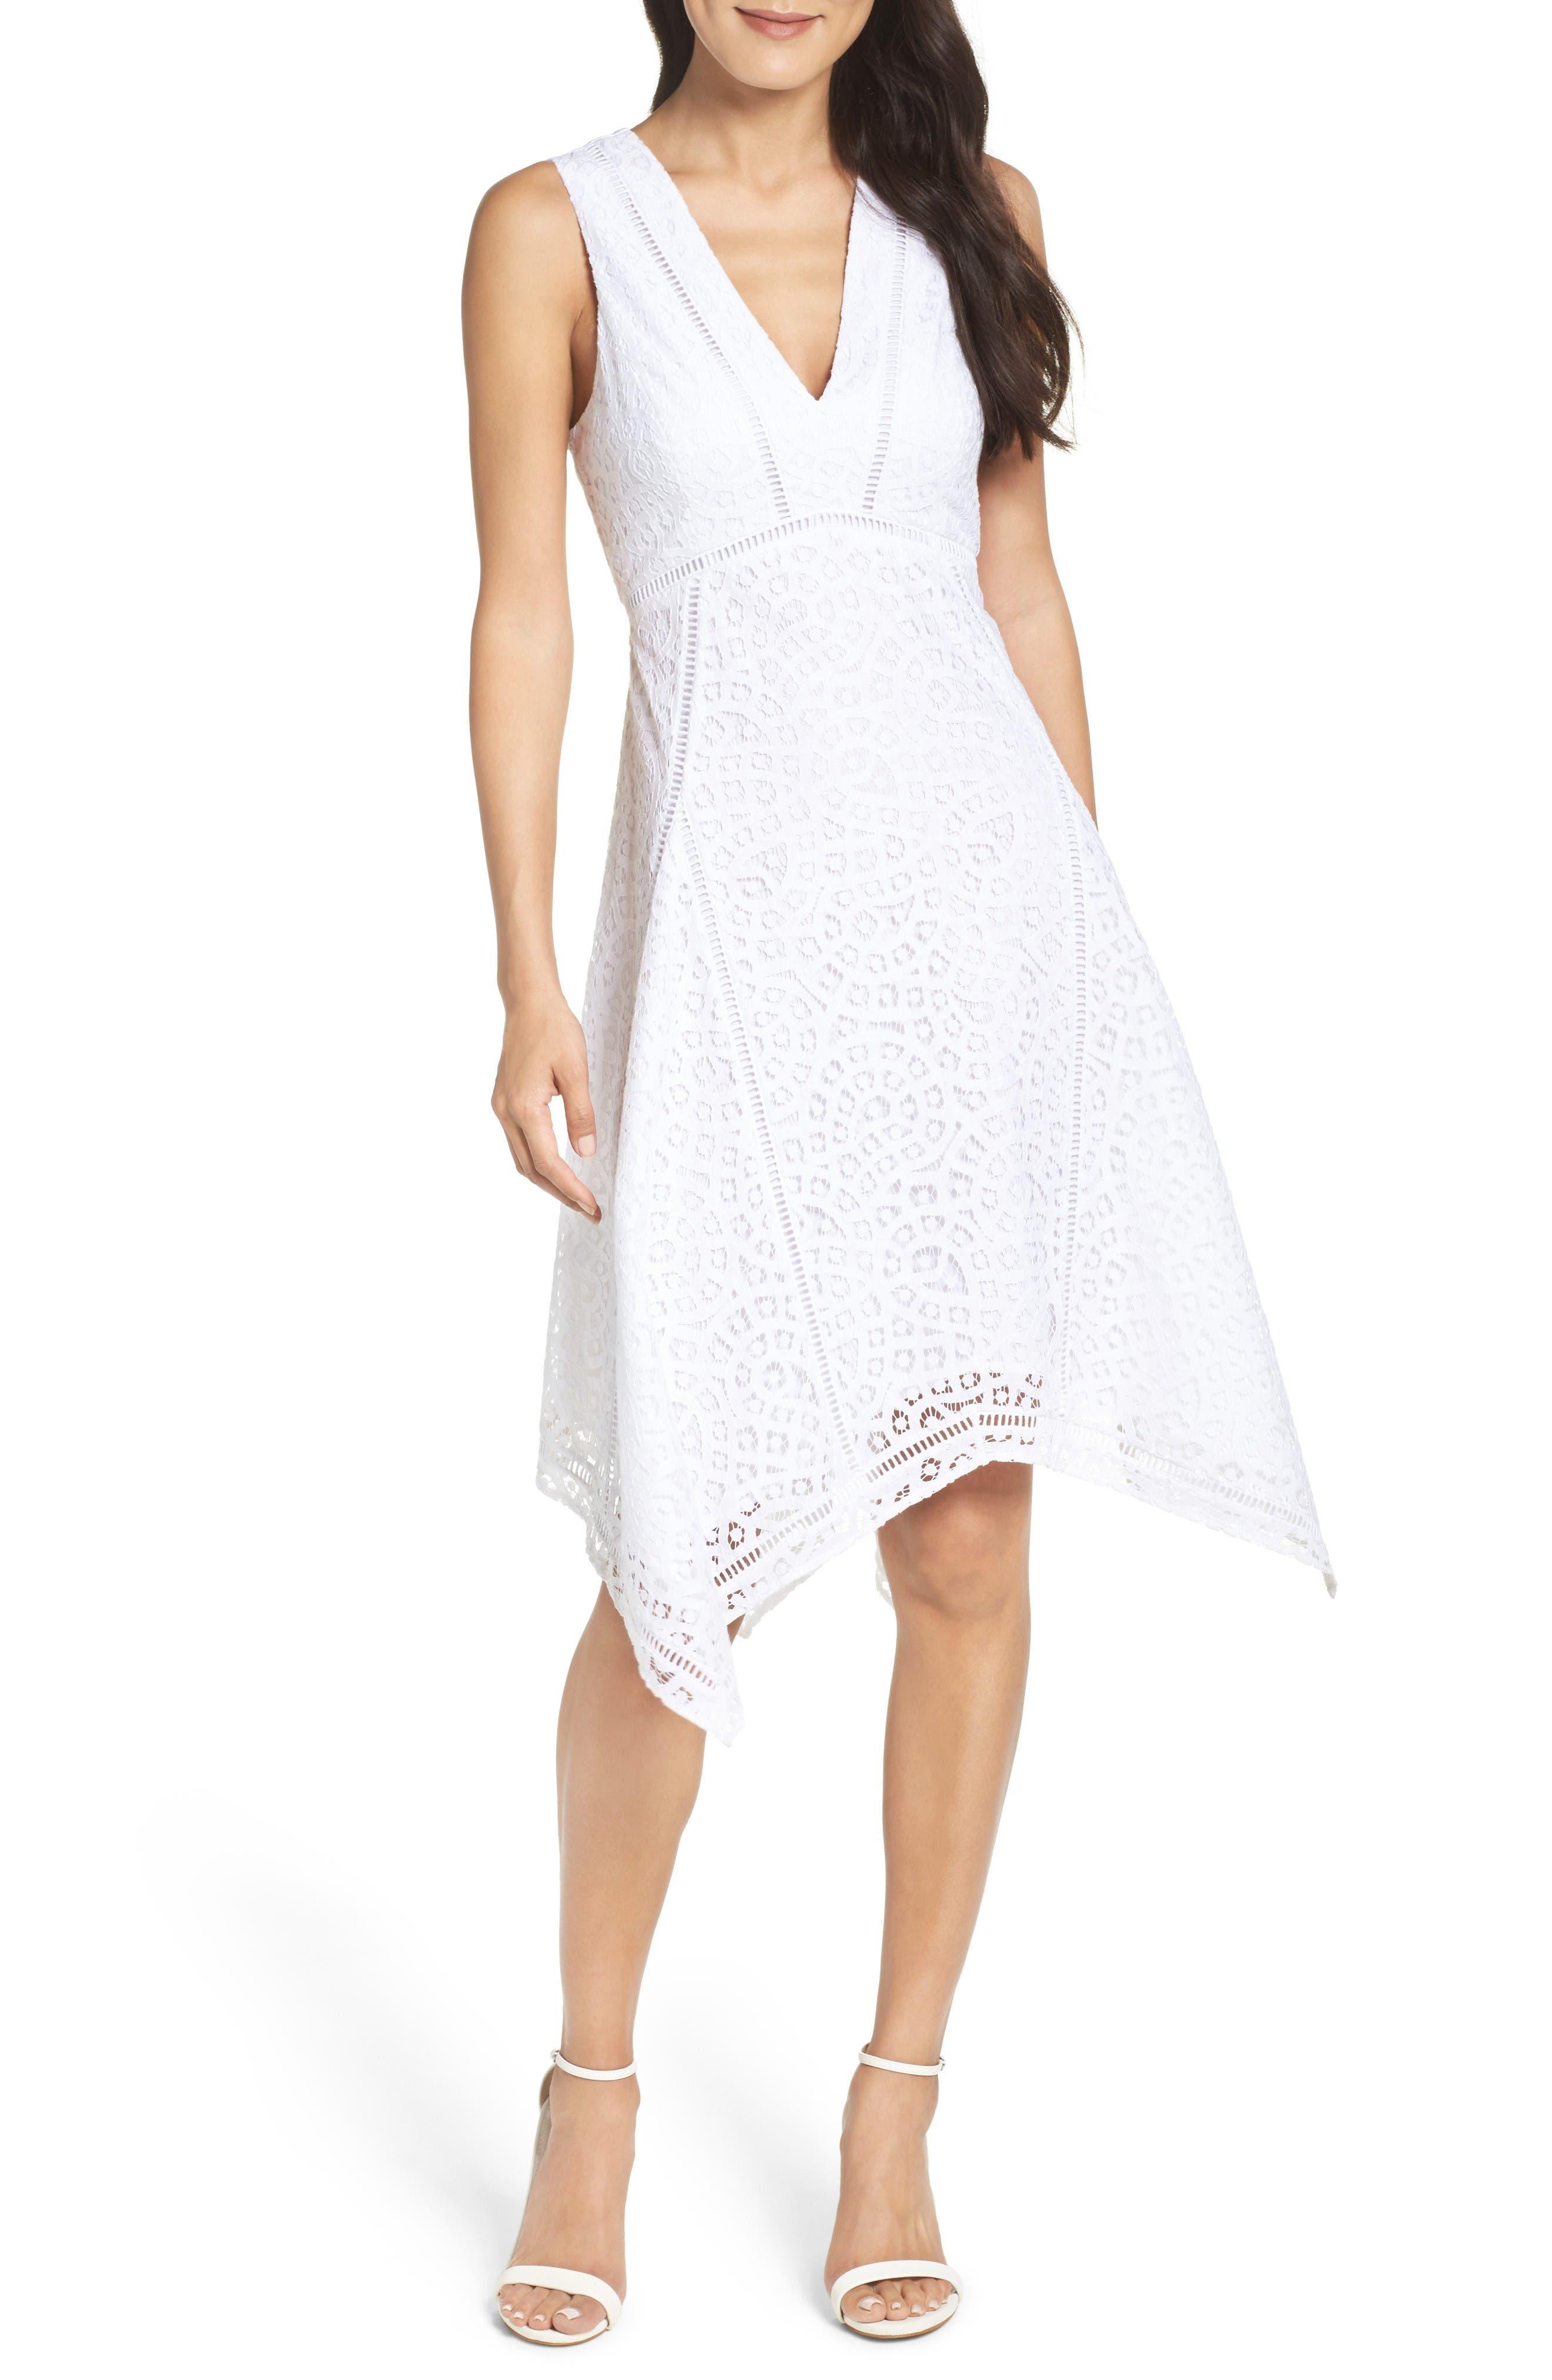 Alternate Image 1 Selected - Lilly Pulitzer® Elyse Dress